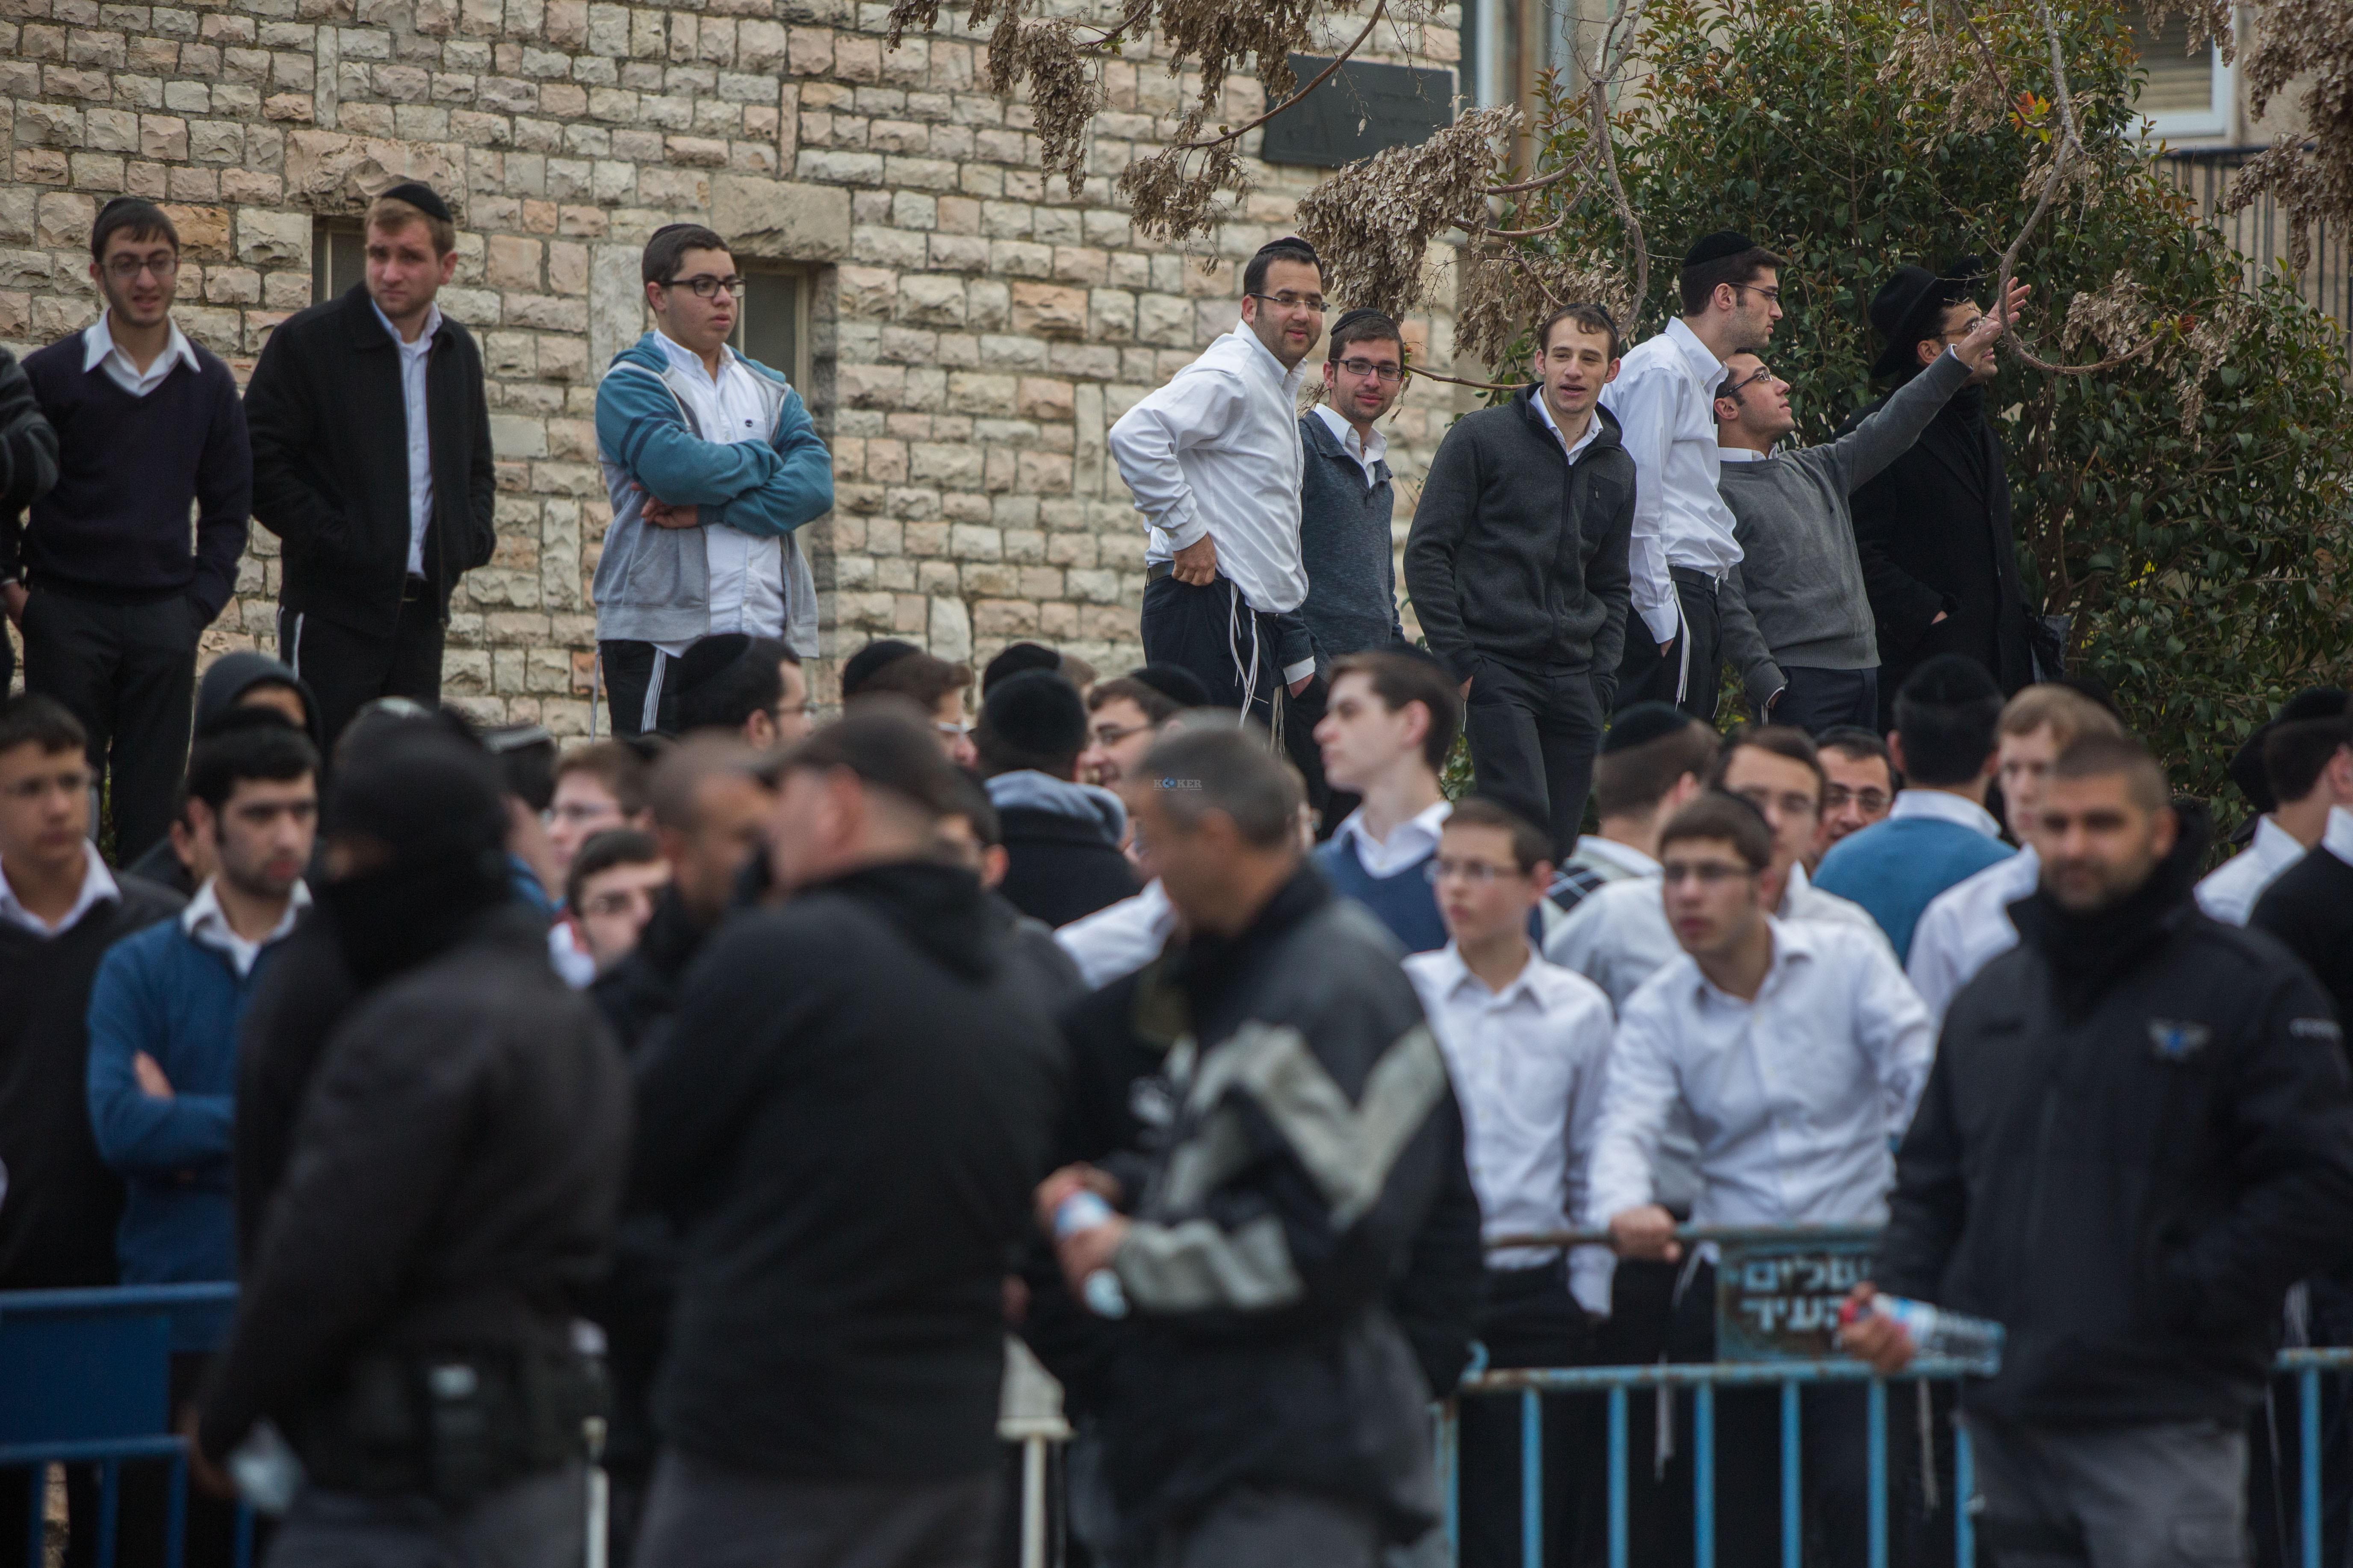 Israeli security force